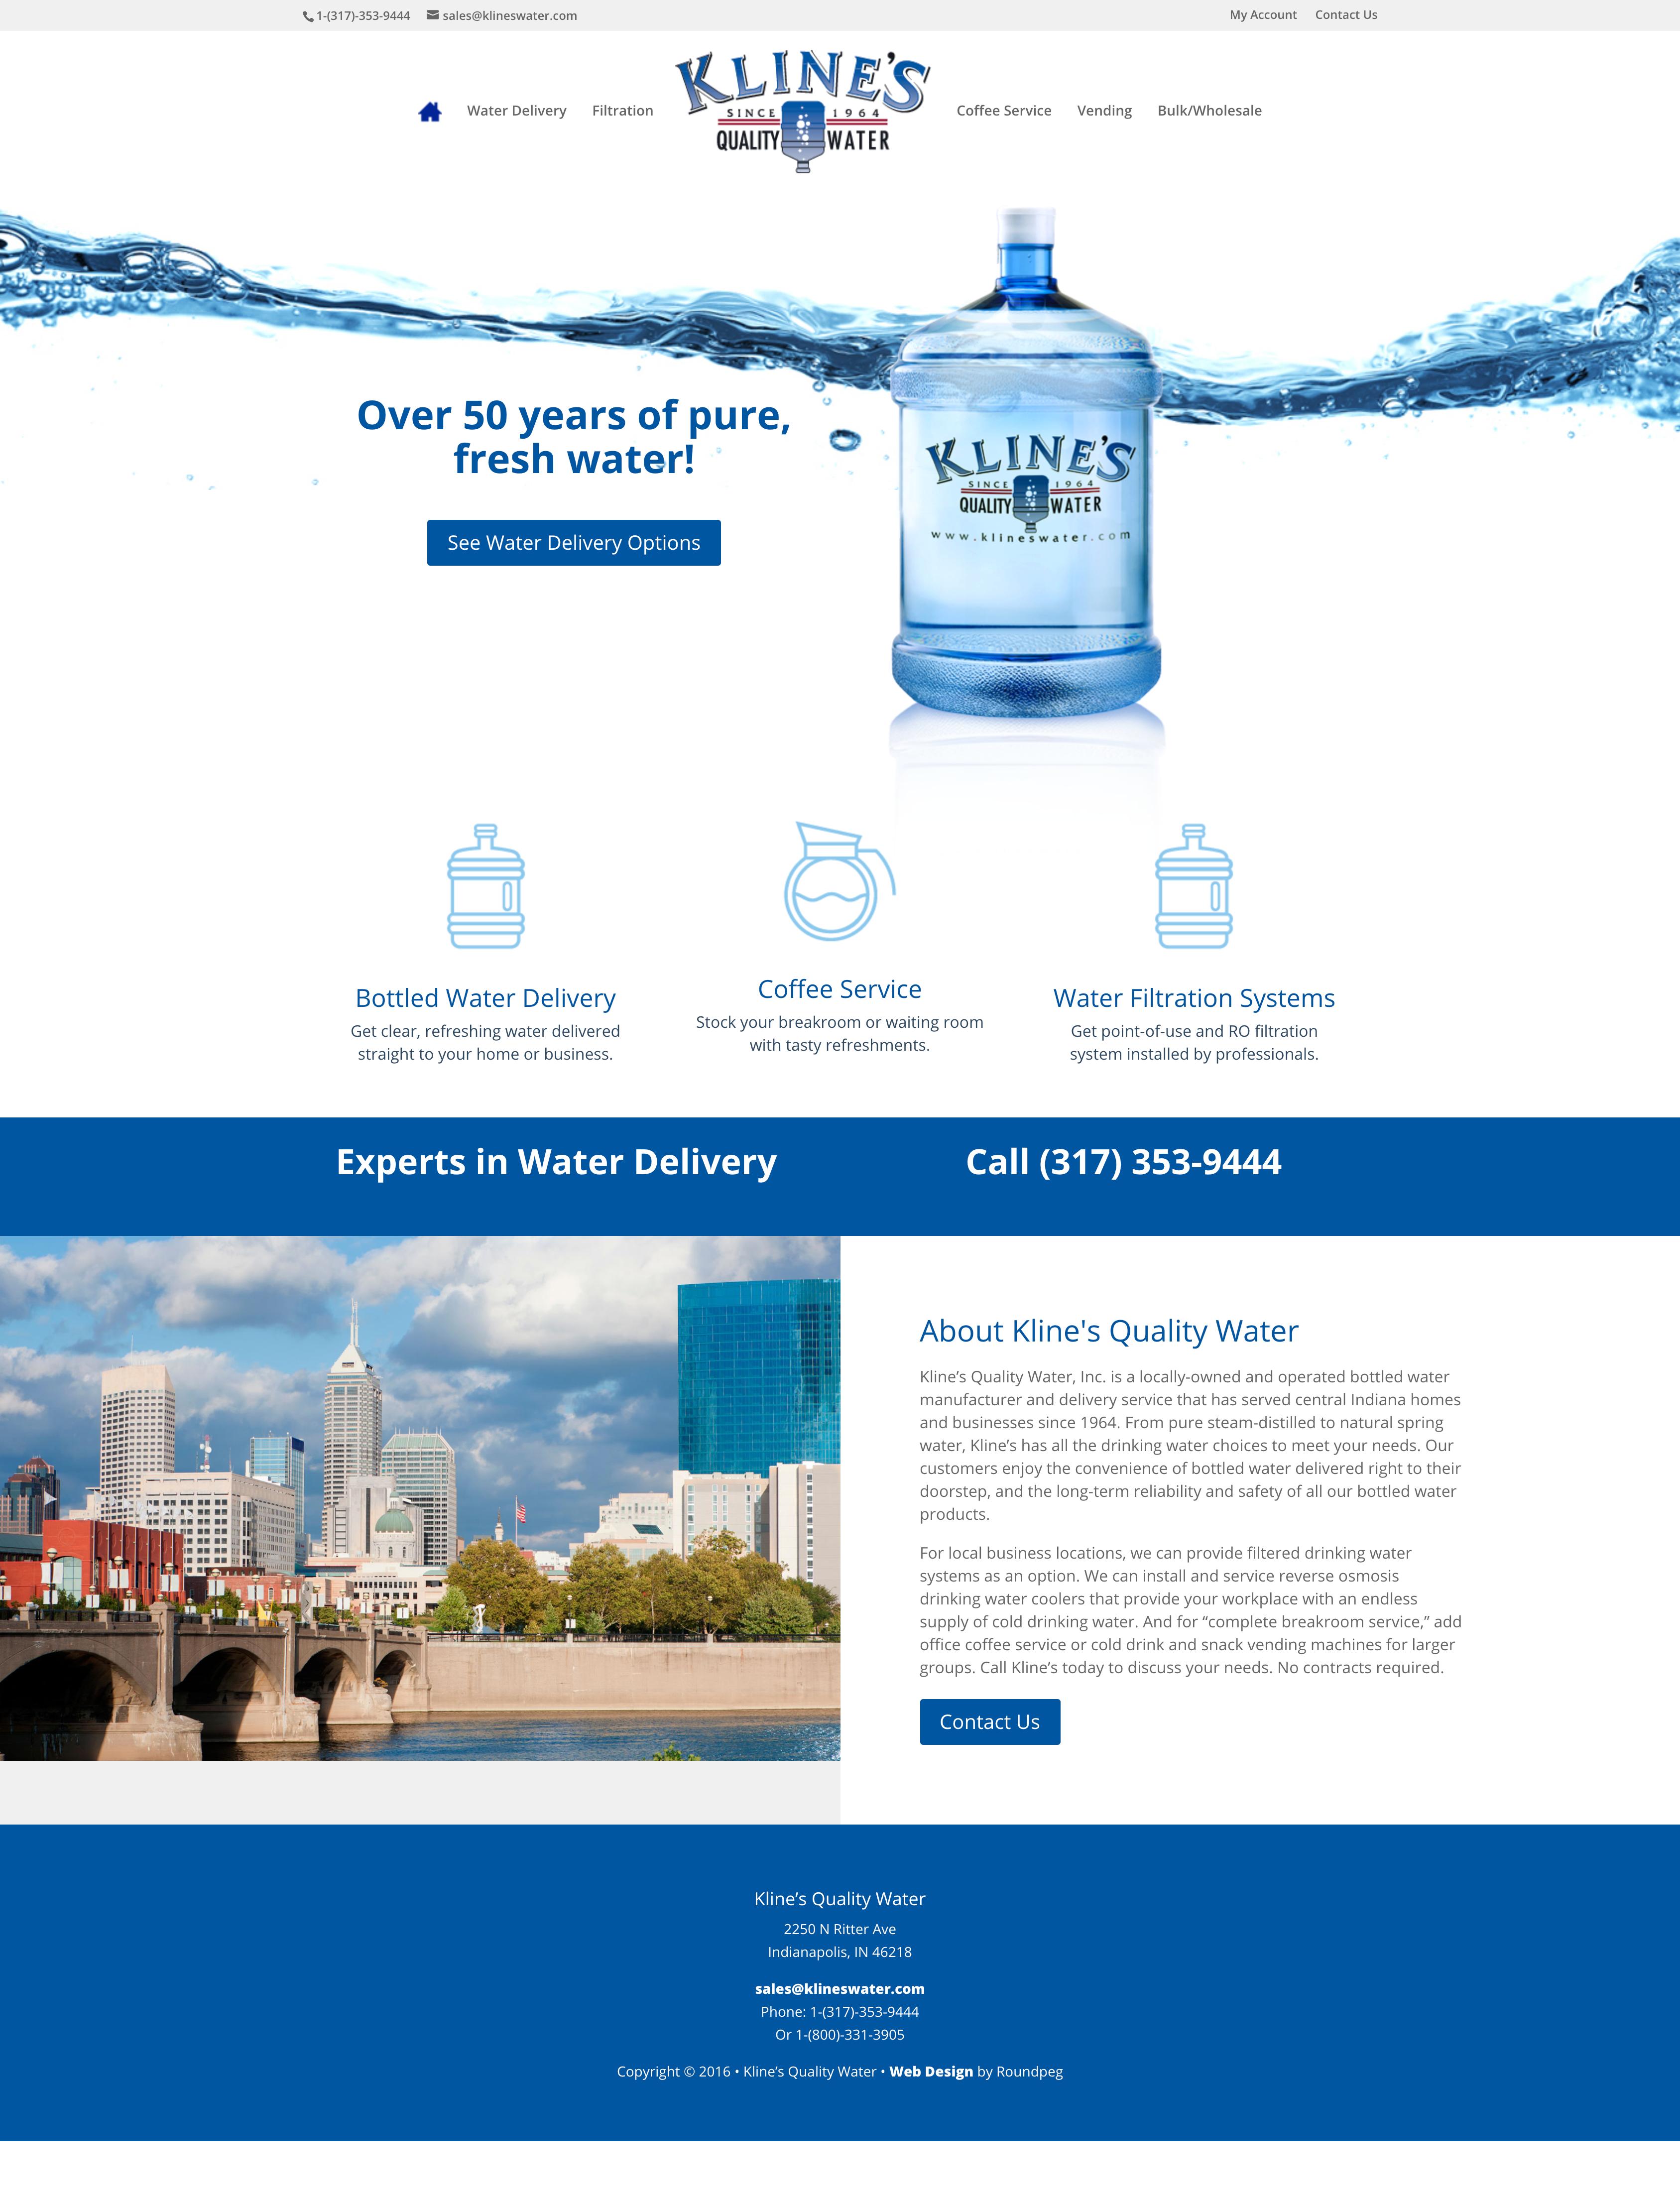 Kline S Quality Water Web Design Sample Roundpeg Indianapolis Small Business Web Design Corporate Web Design Web Design